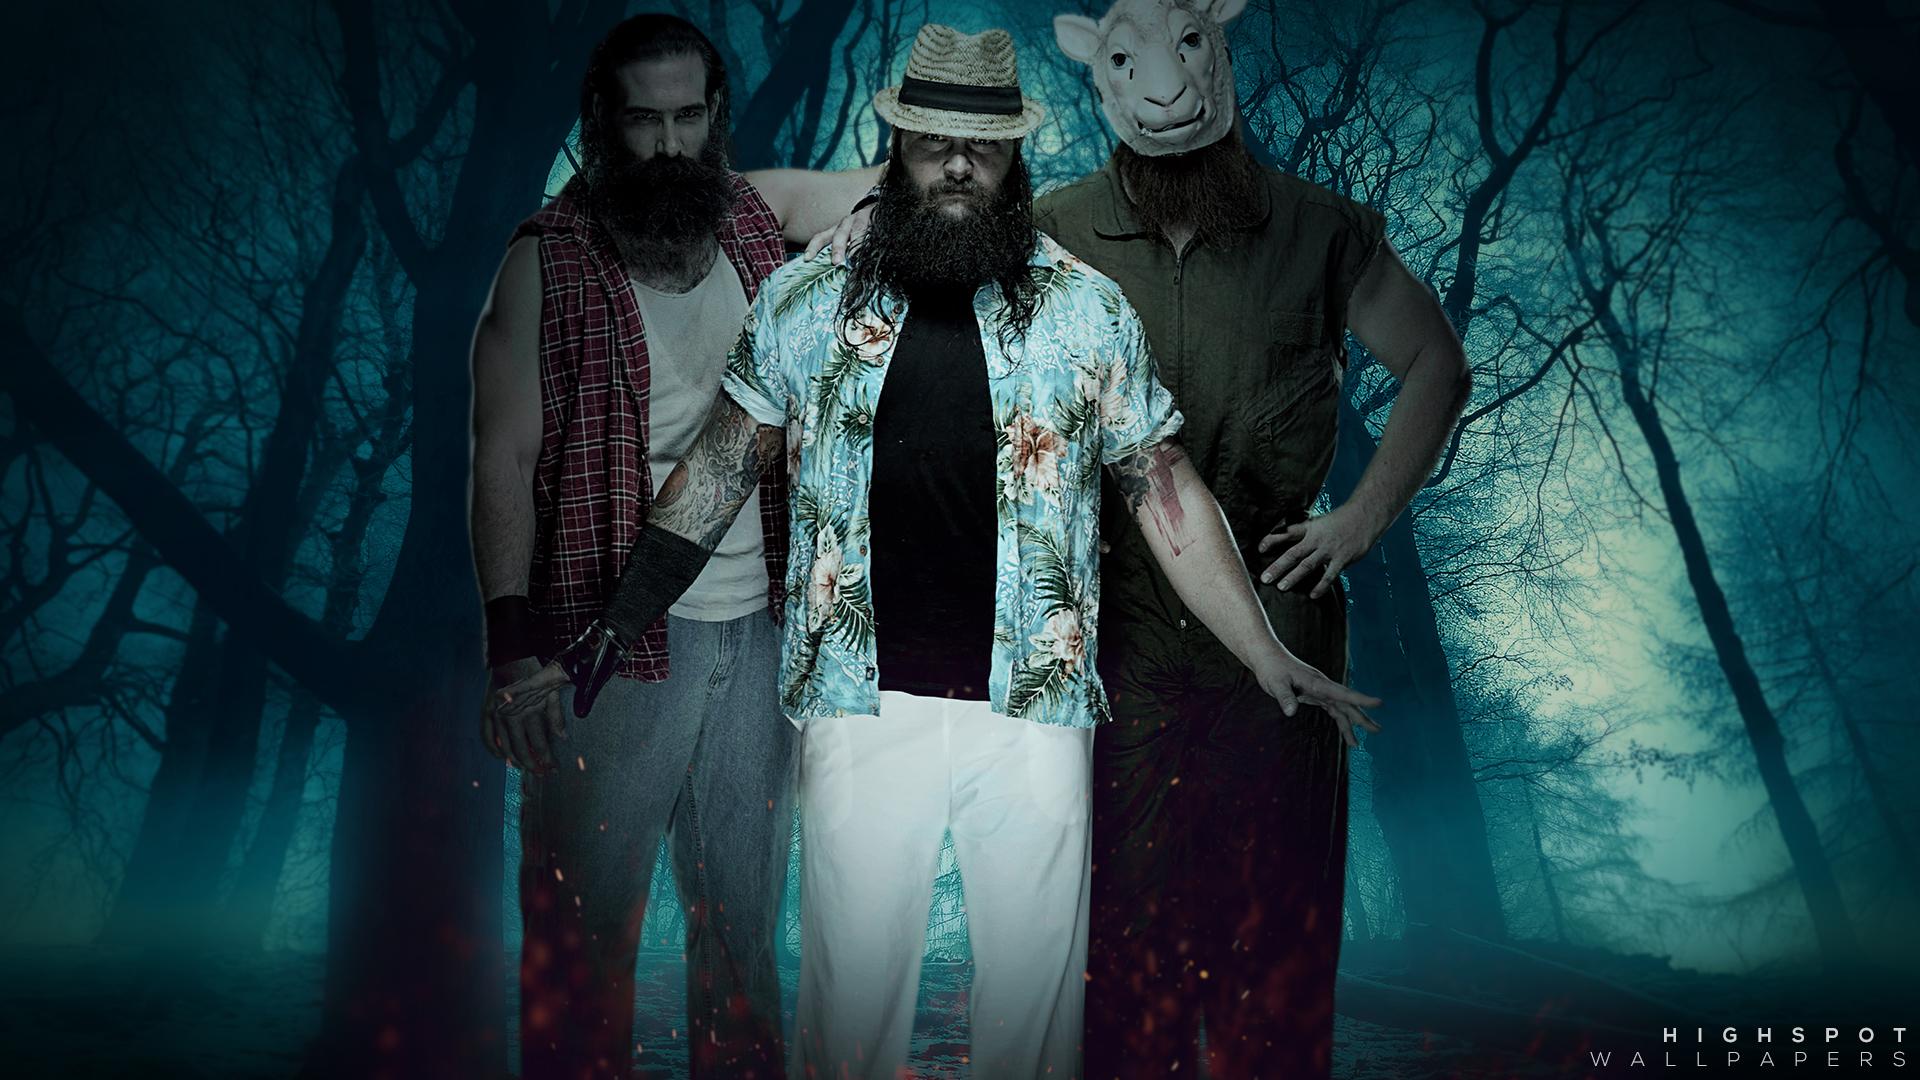 Batista Hd Wallpapers 2014 The Wyatt Family Wallpaper Highspot Wrestling Wallpapers